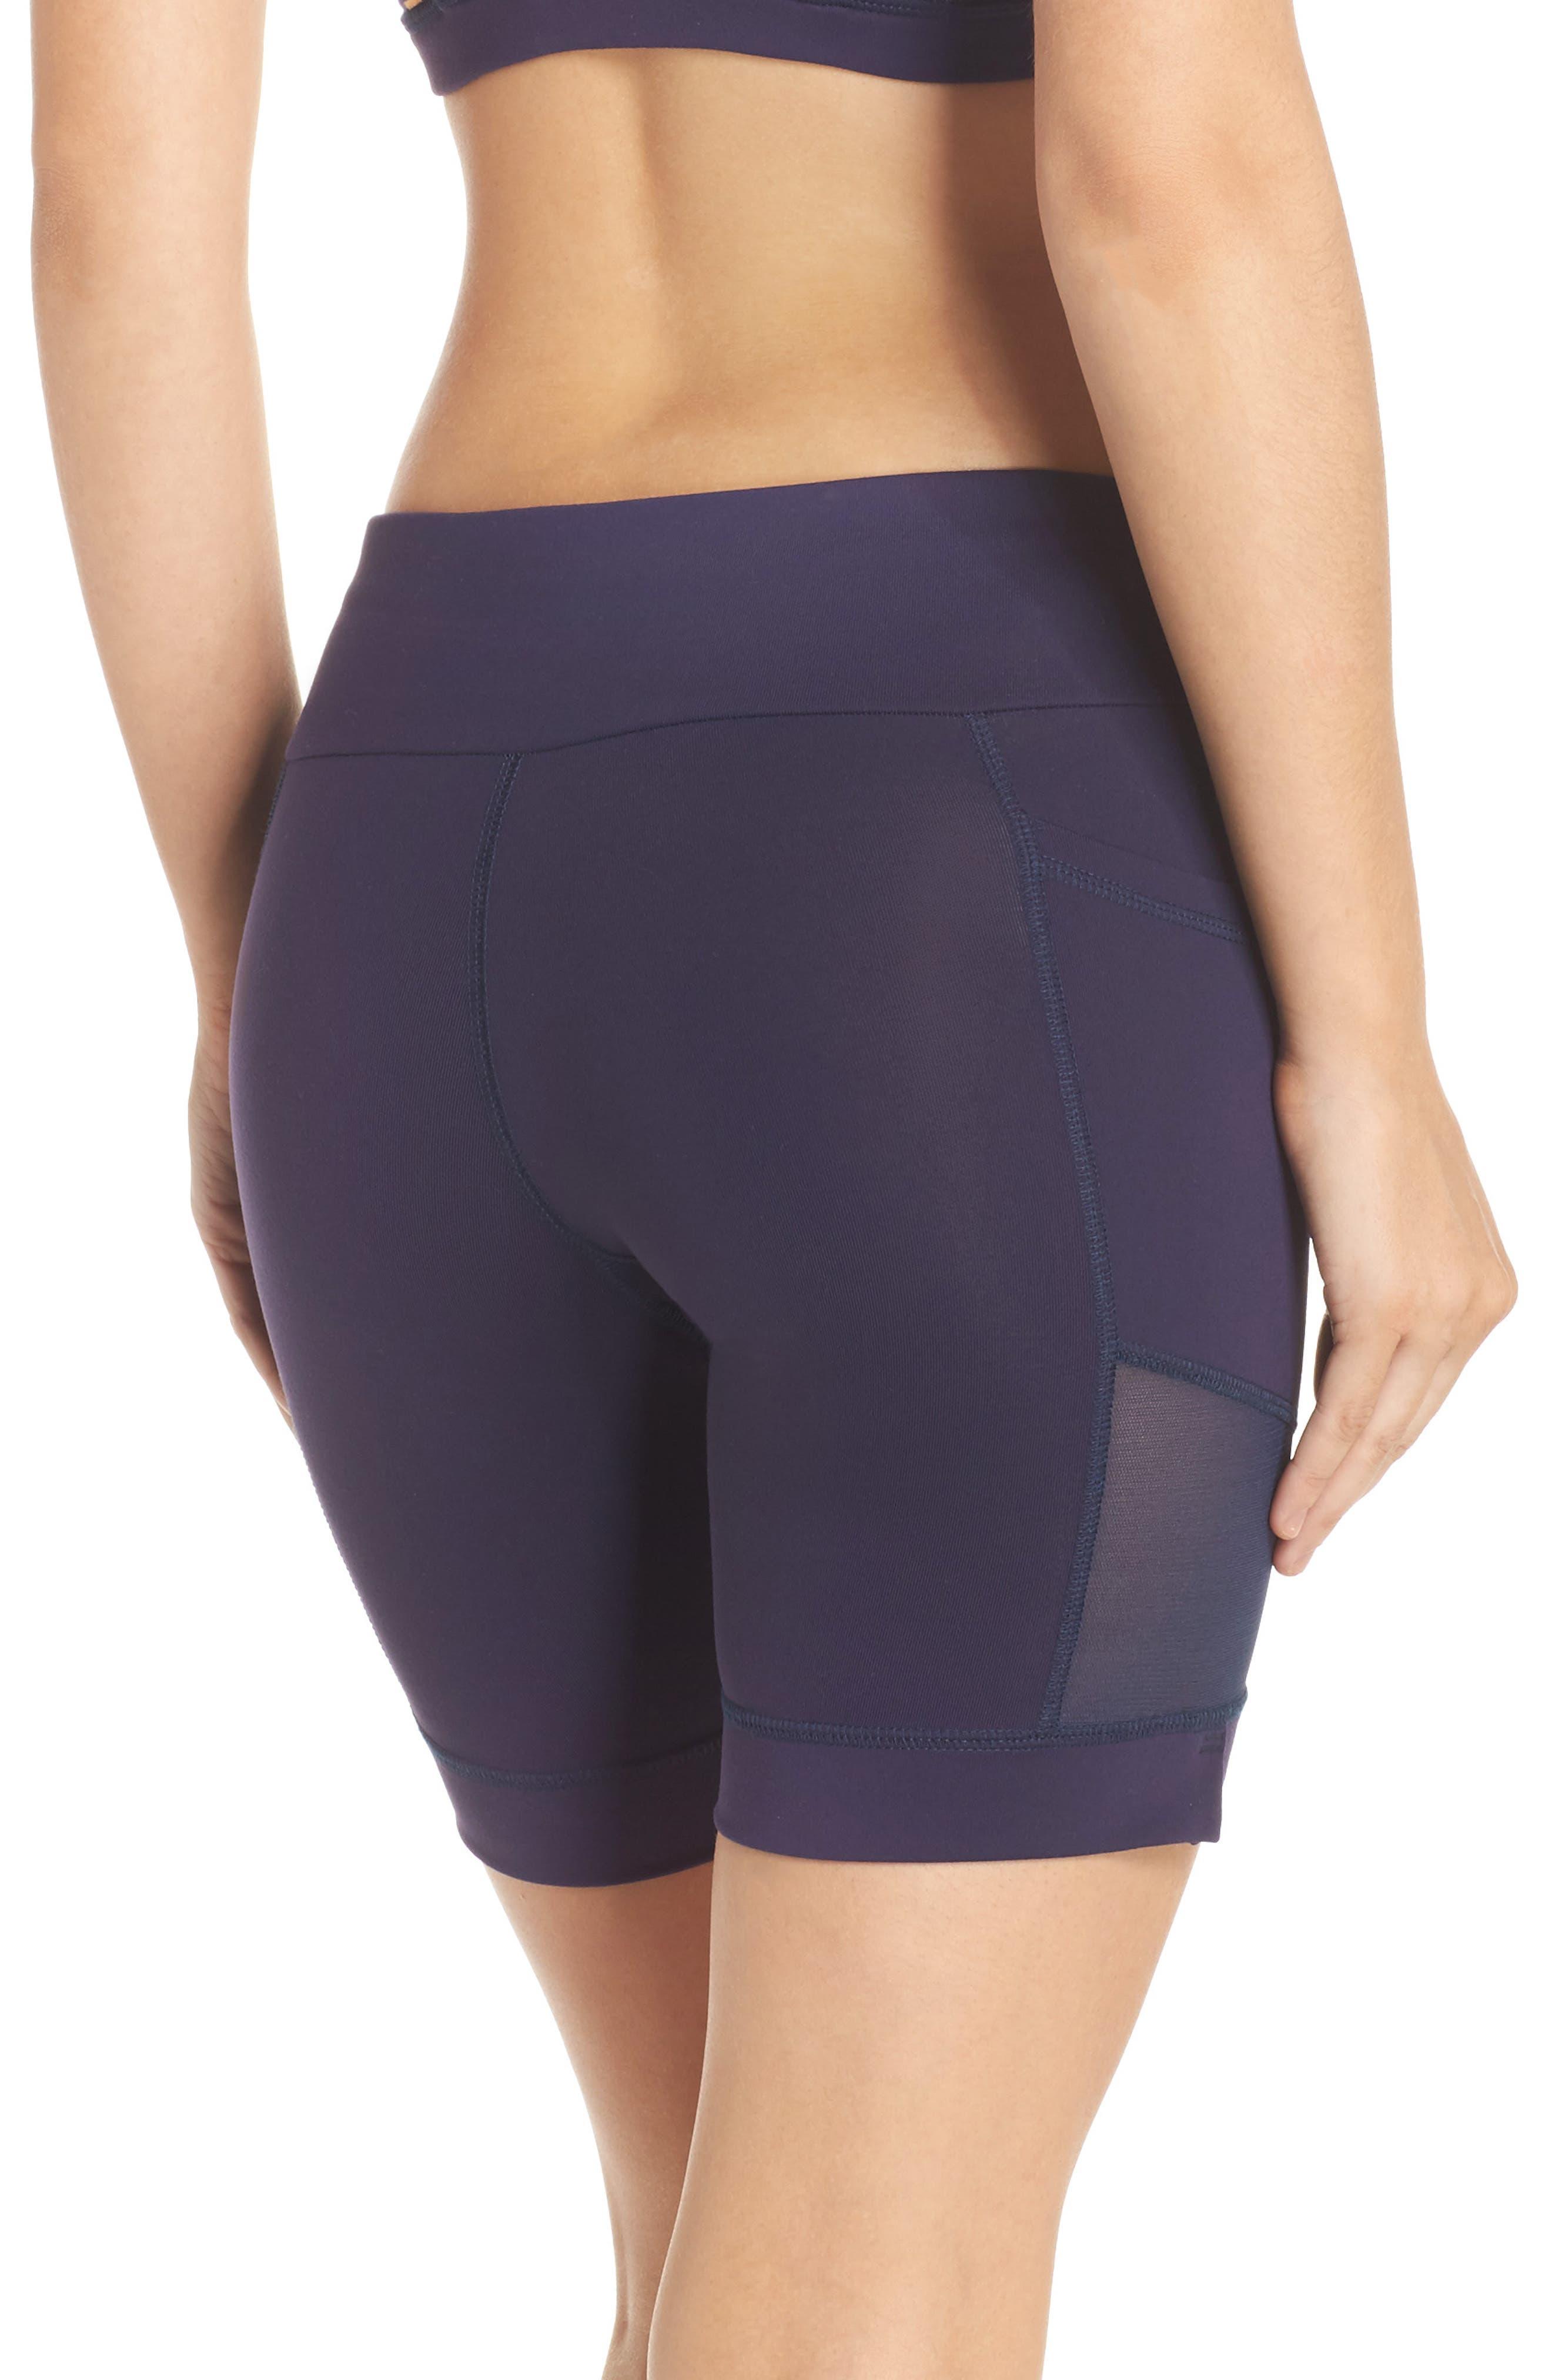 Nicole Active Shorts,                             Alternate thumbnail 2, color,                             Navy Mesh